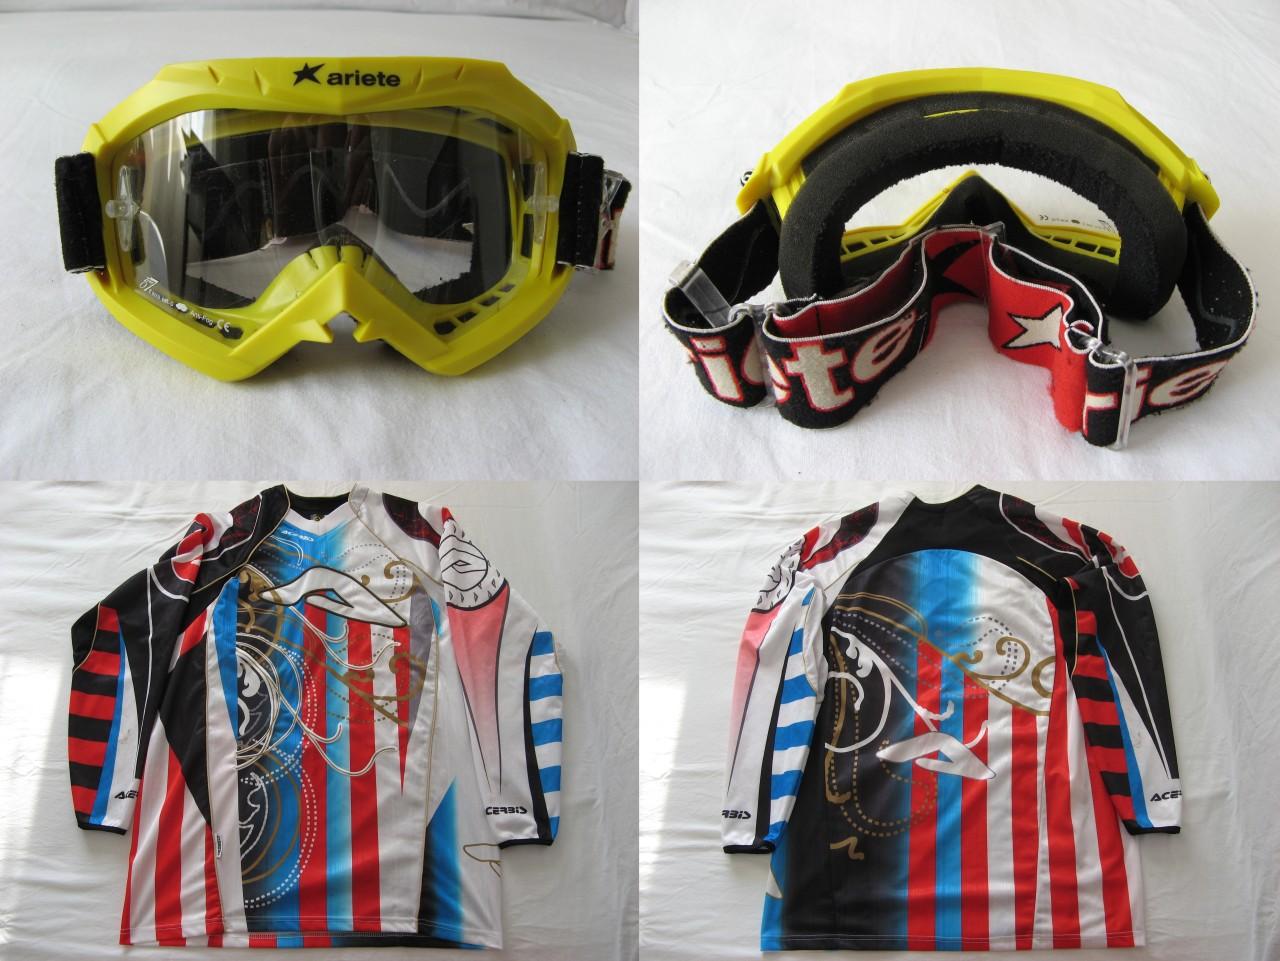 Echipament moto cross / enduro / atv